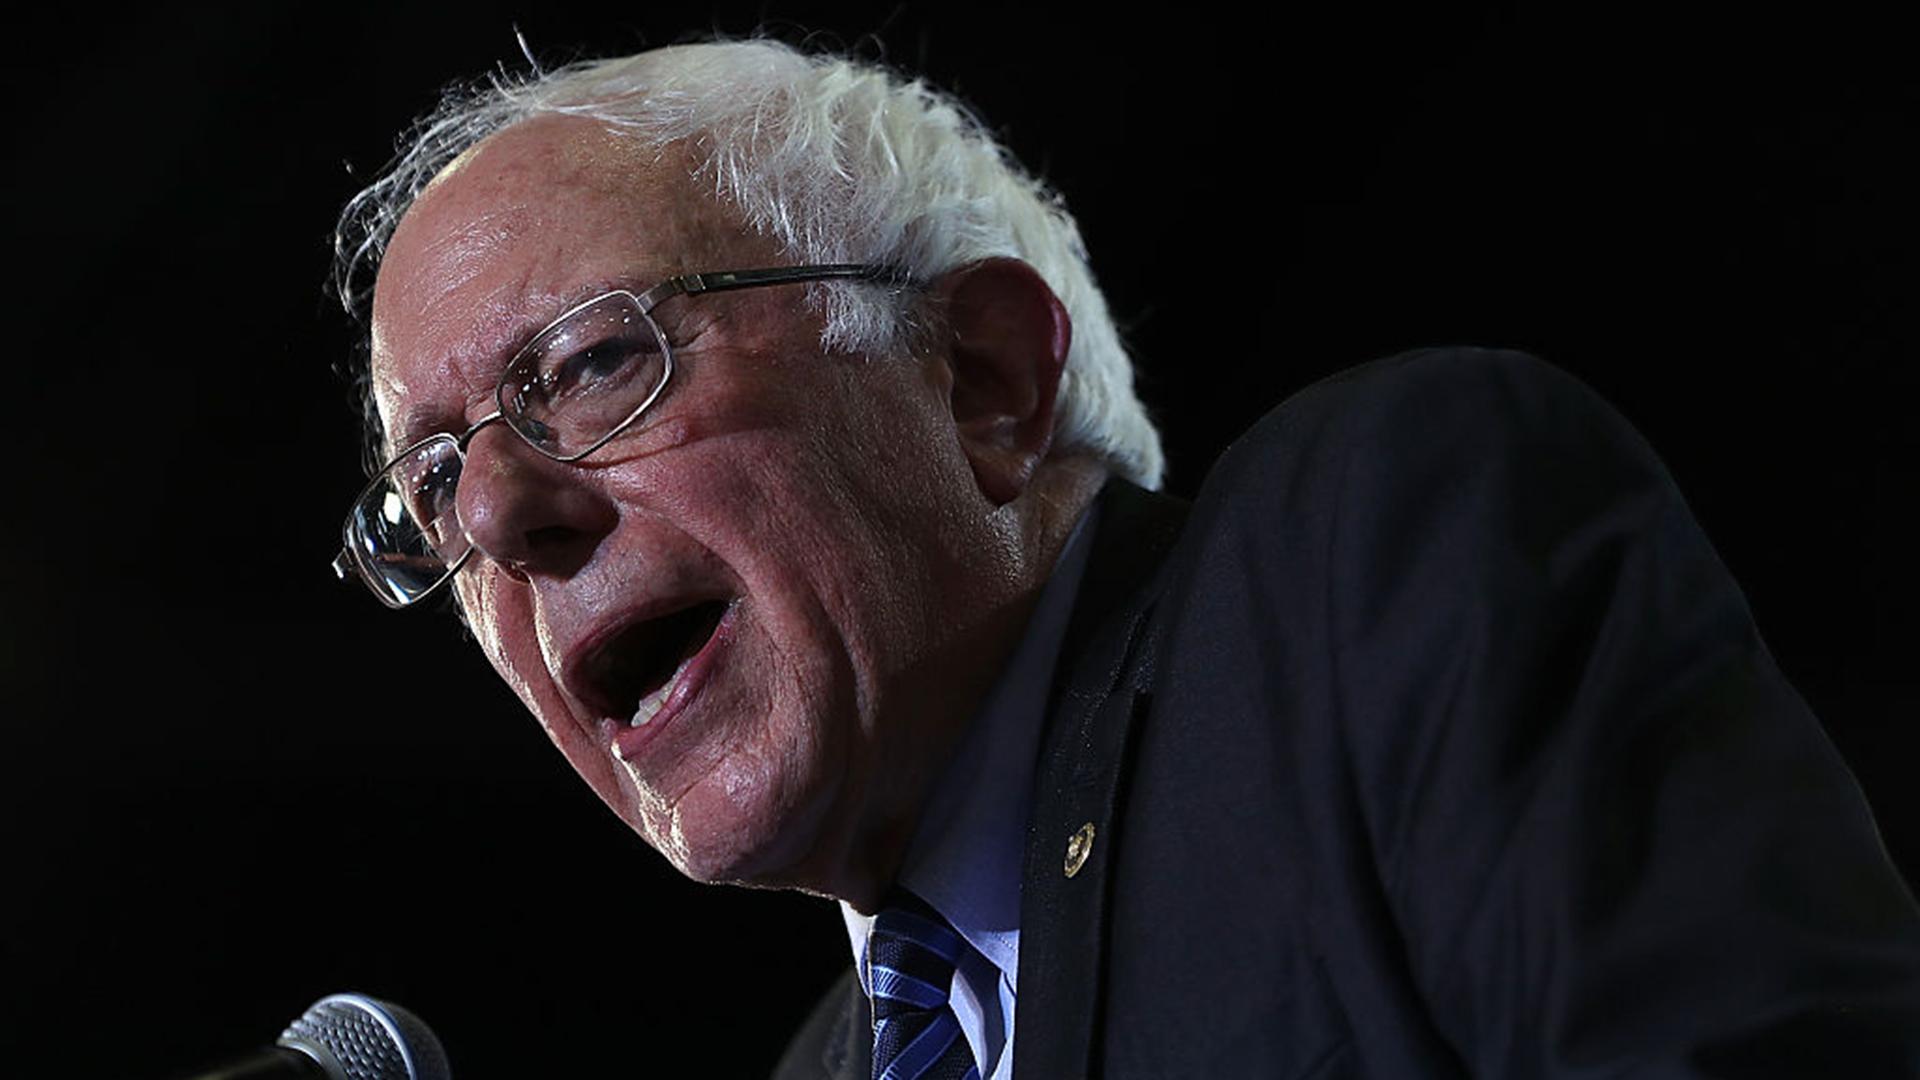 Sen. Bernie Sanders is pictured in this stock photo.